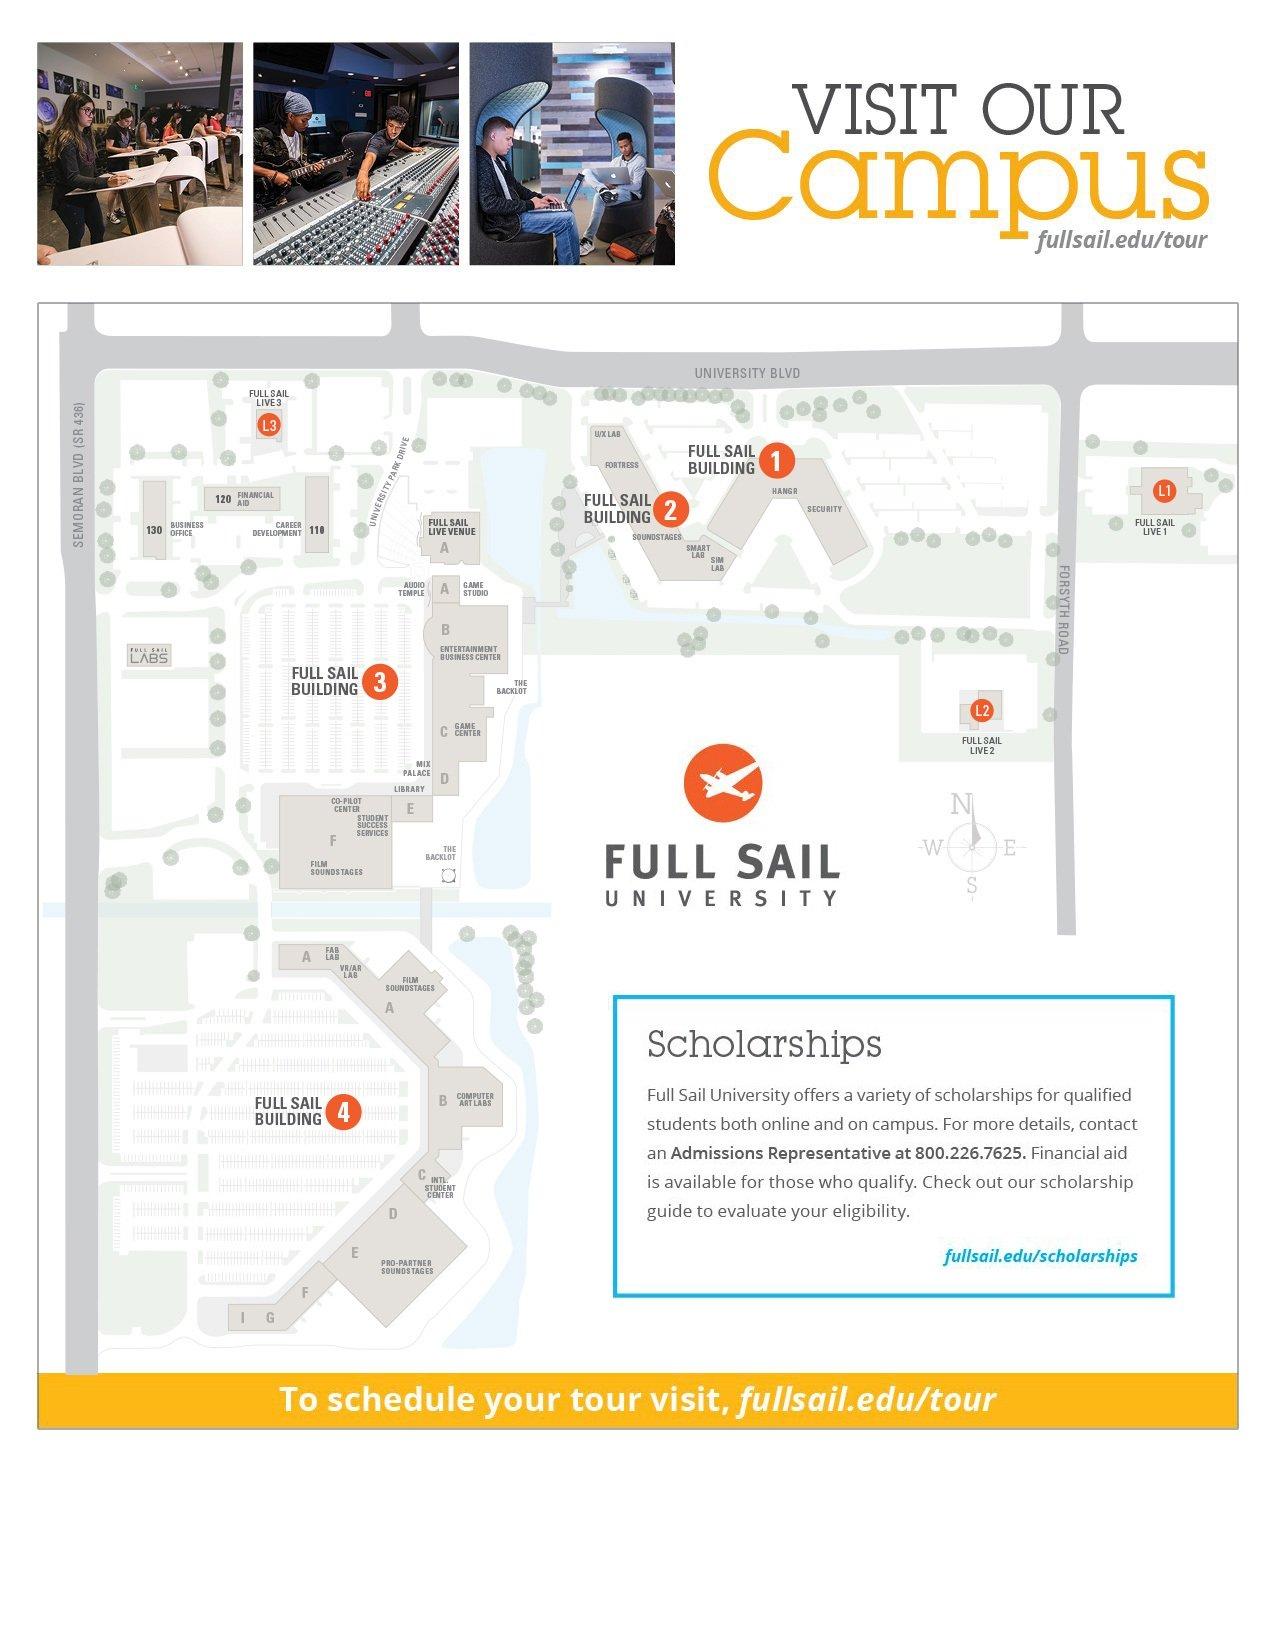 Contact Regarding Full Sail University Class Schedule